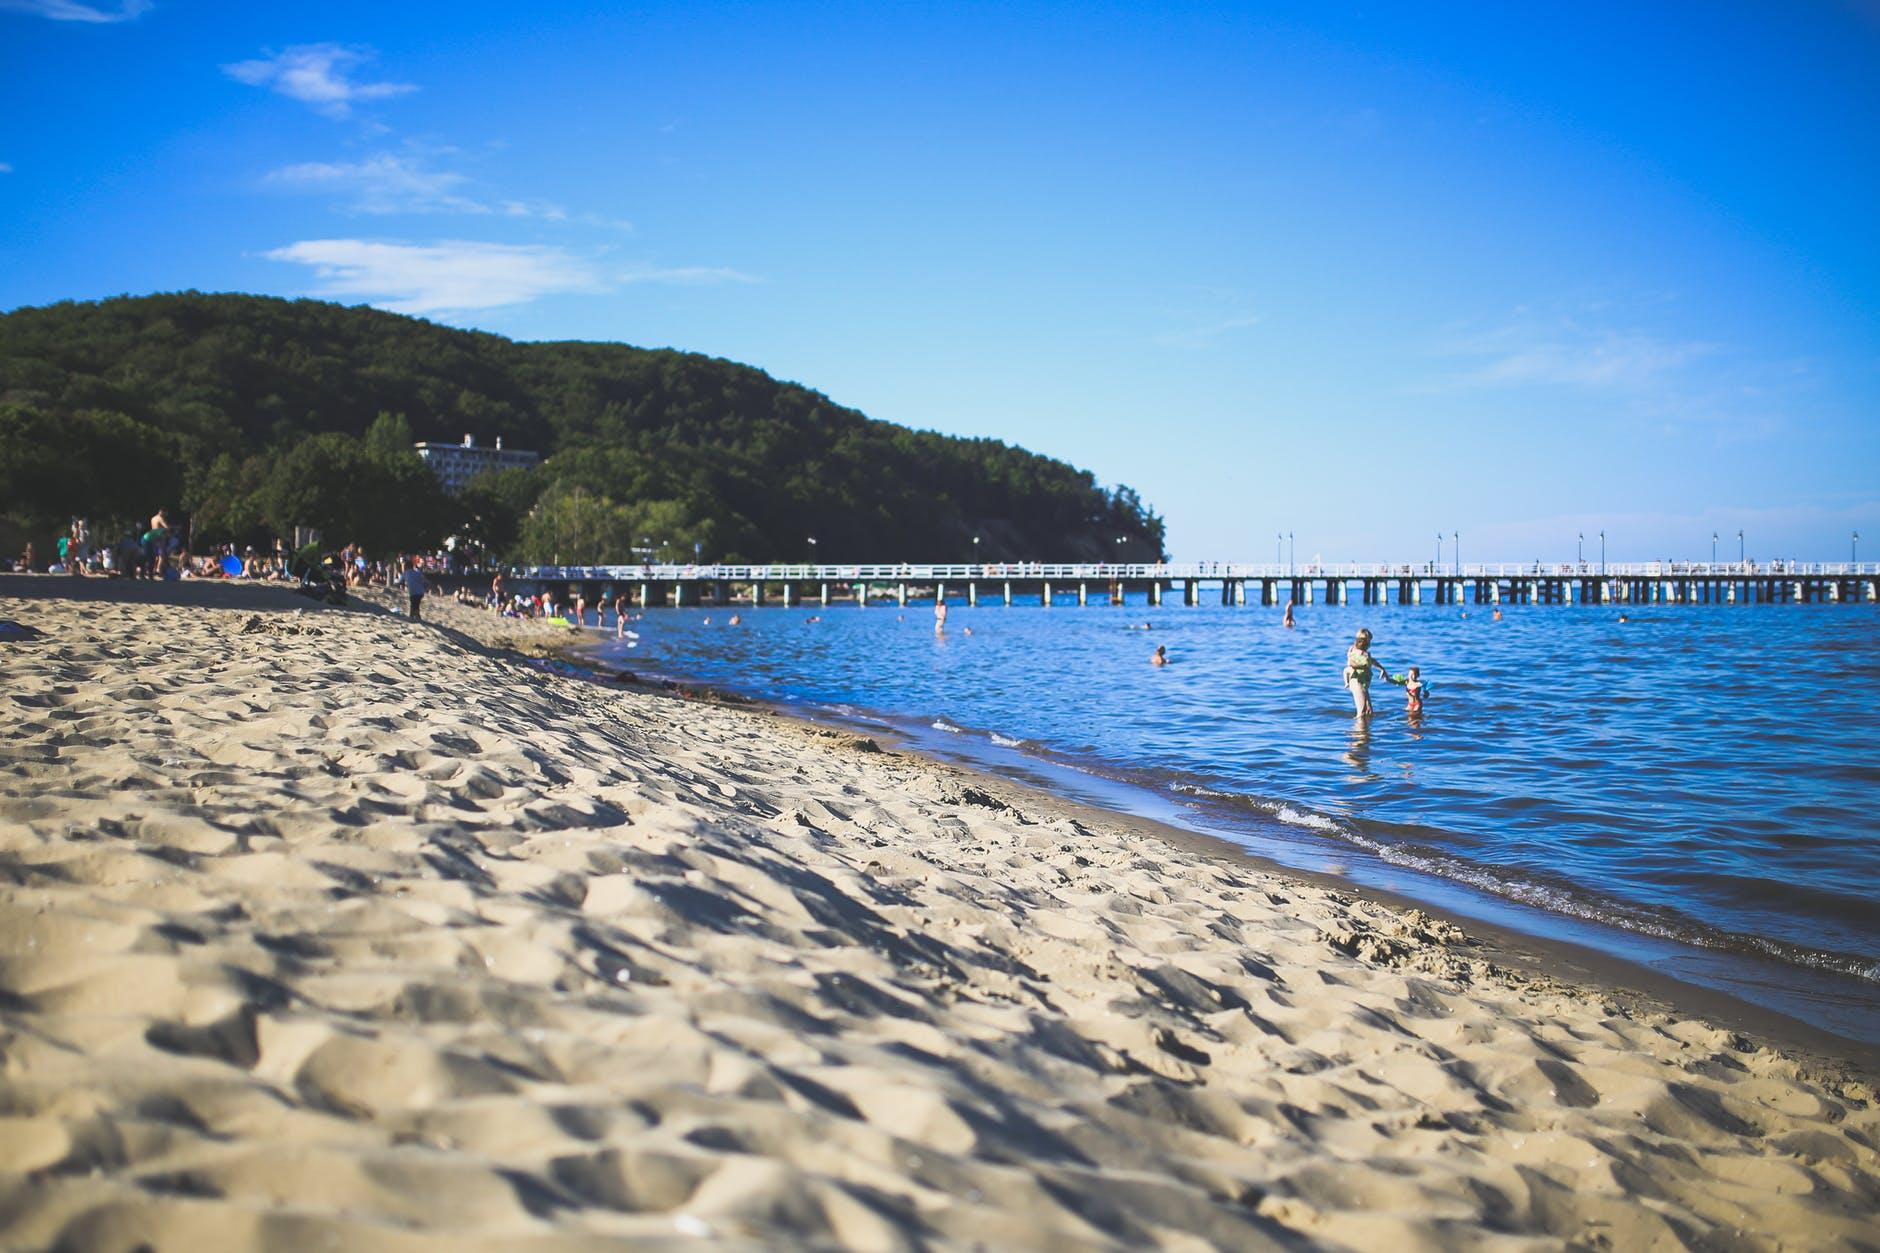 sea-beach-holiday-vacation-jpg1557116348.jpg